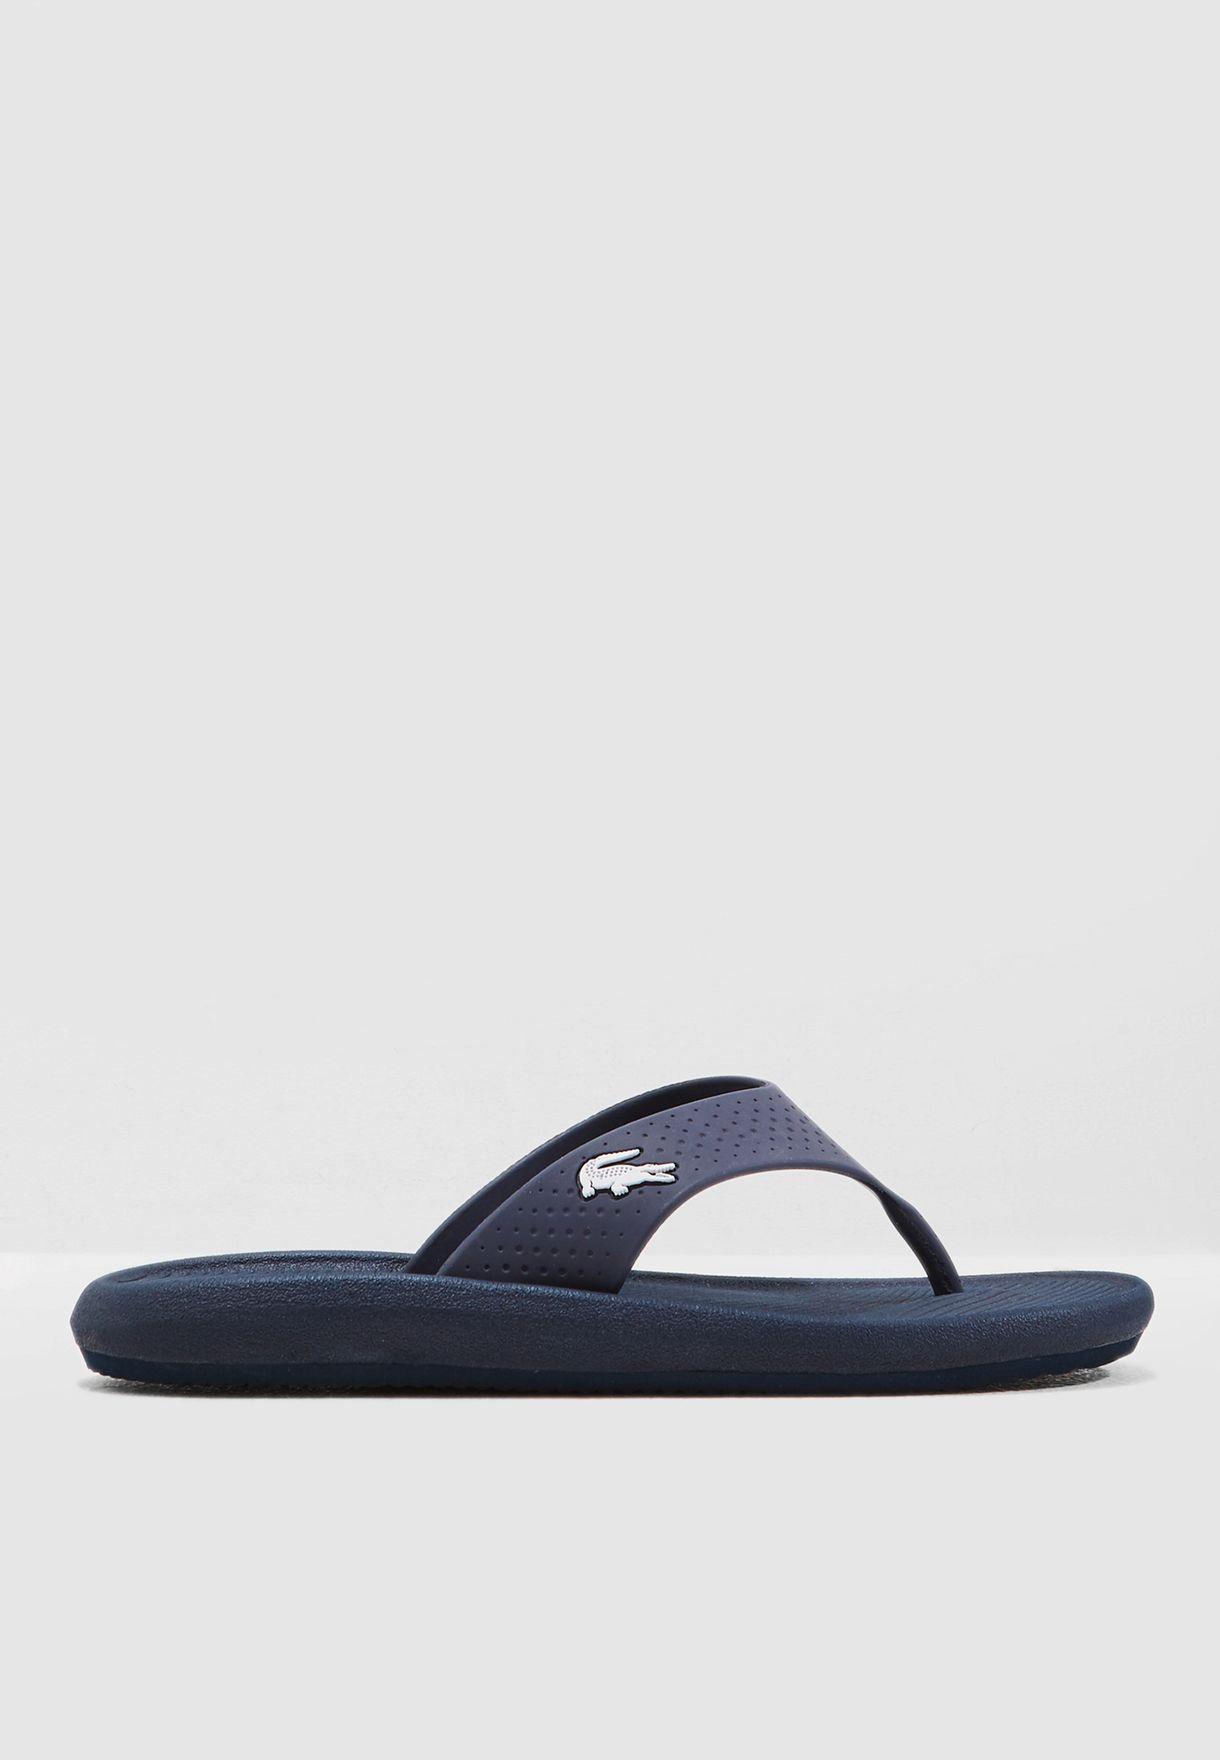 Croco Sandal